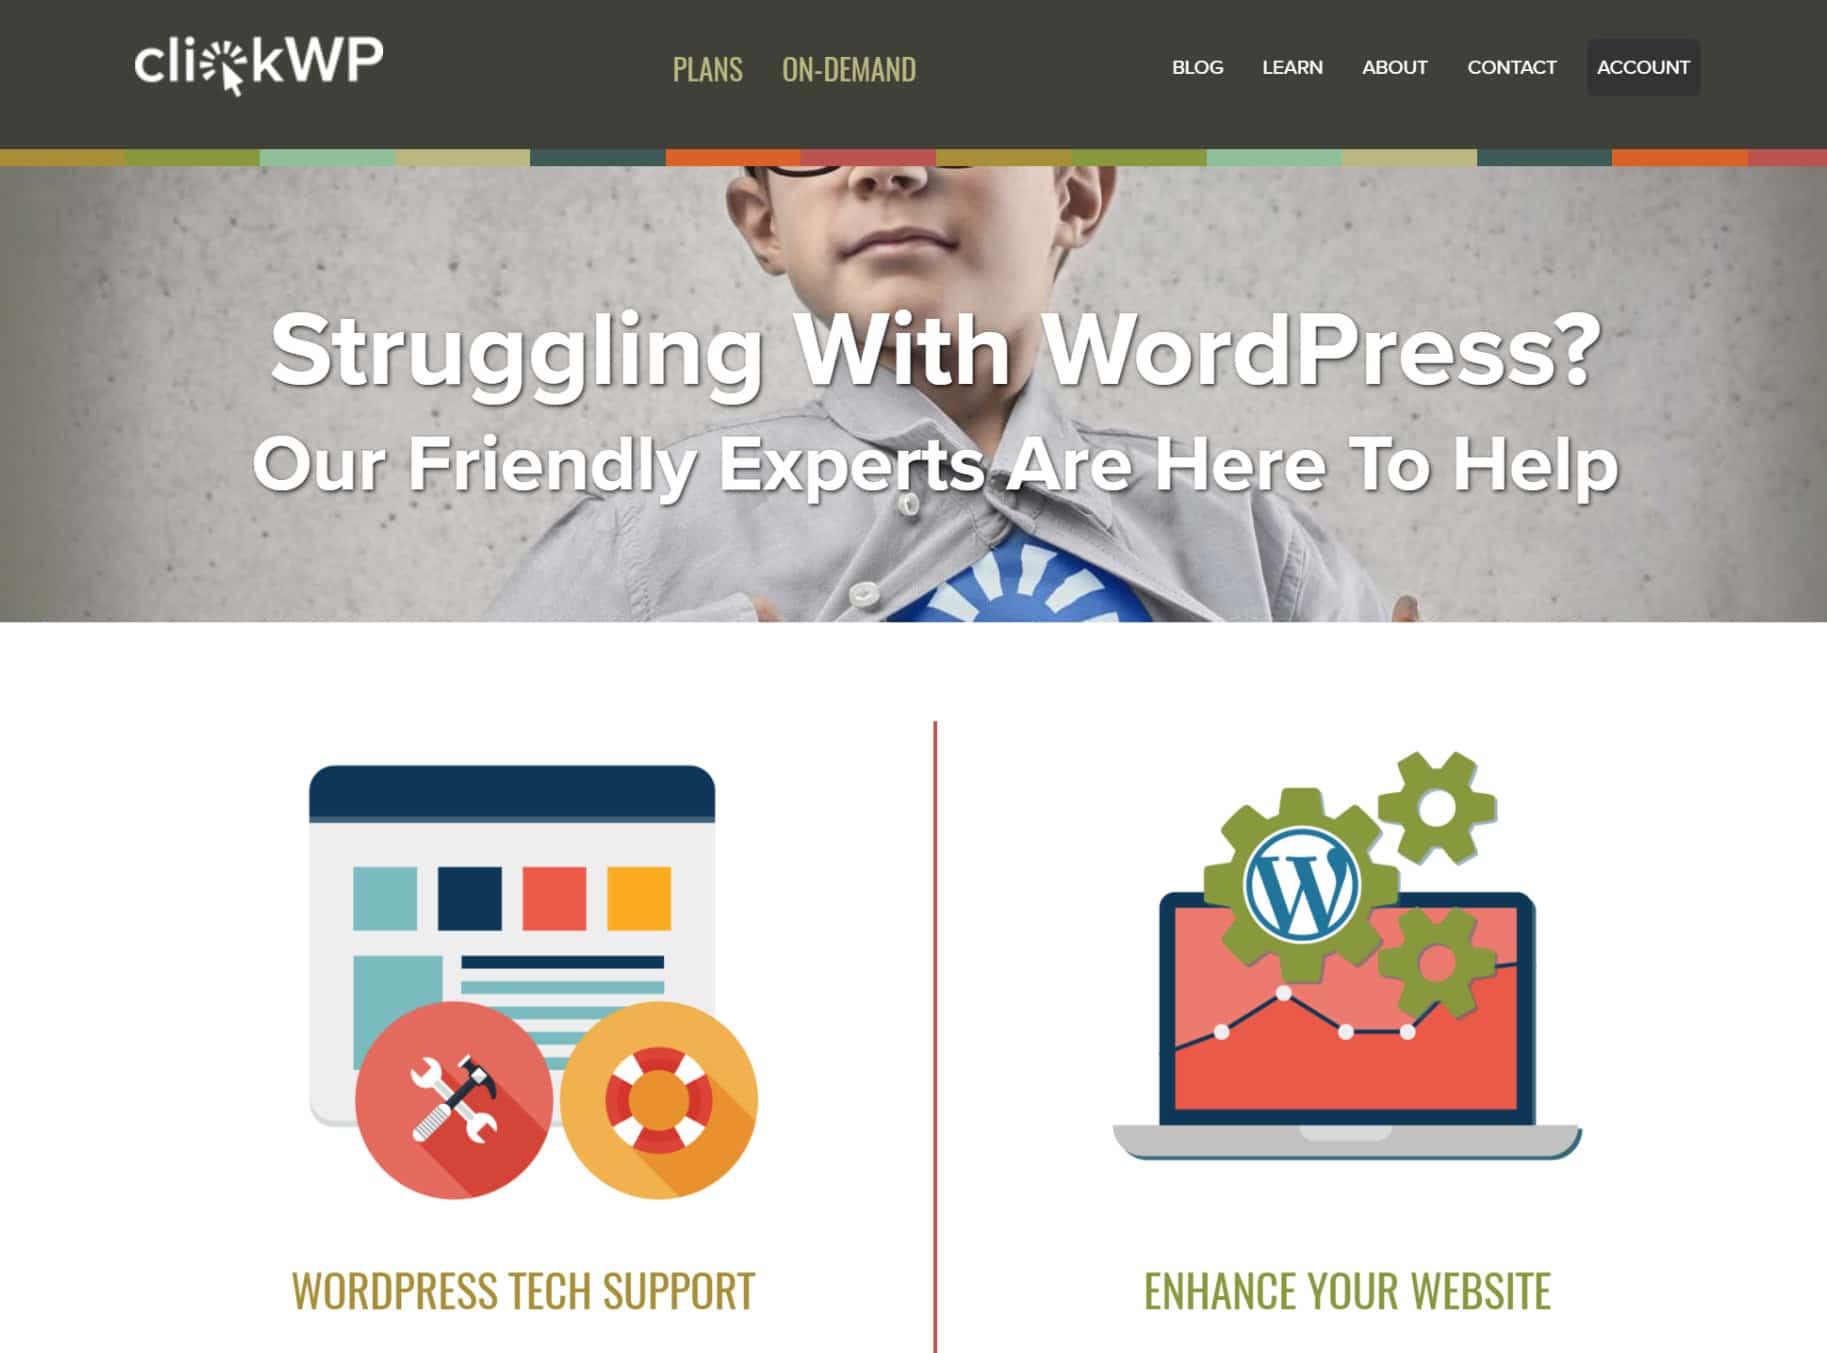 clickwp WordPress development